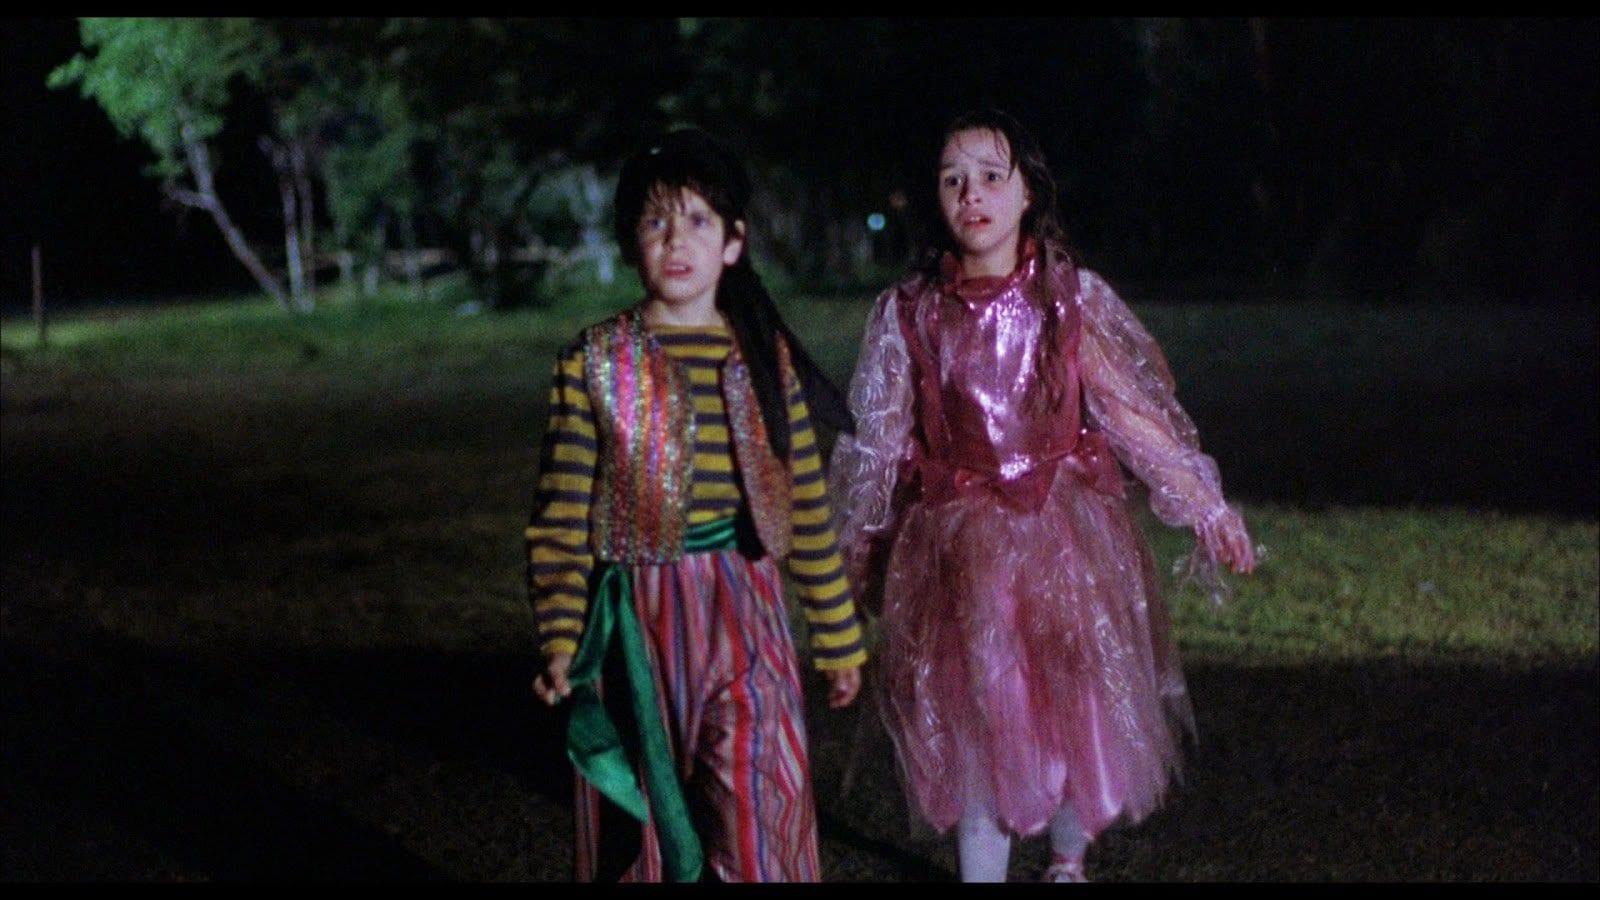 Jeffrey Landman and Danielle Harris in 'Halloween 5'